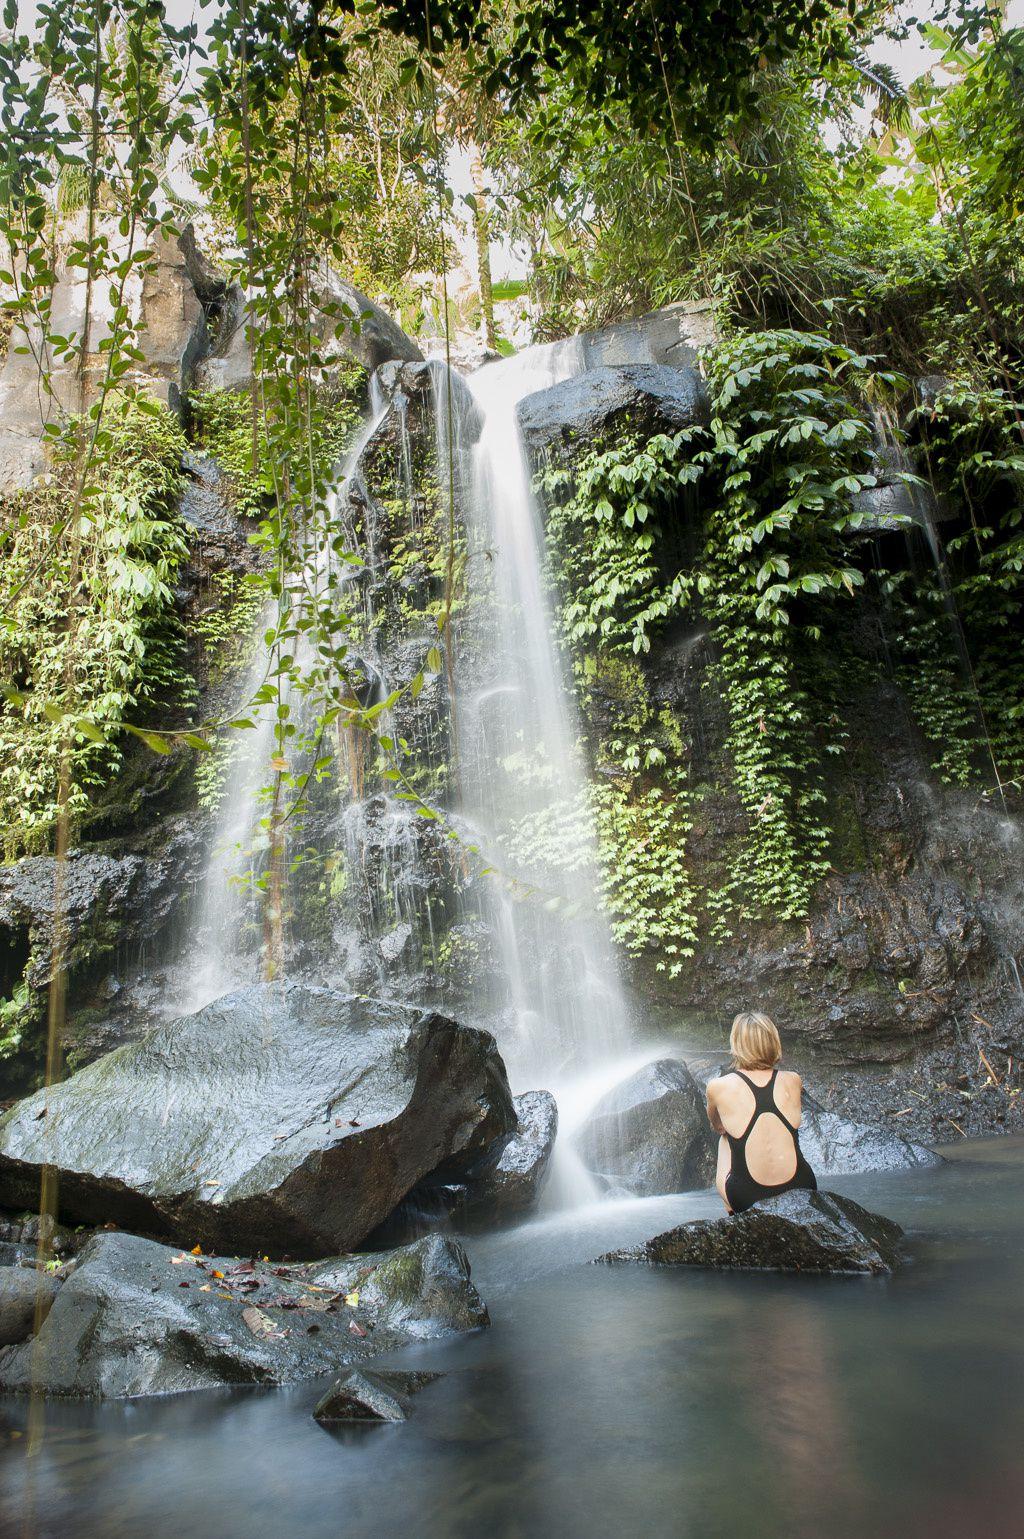 Bali vert (balivernes?)